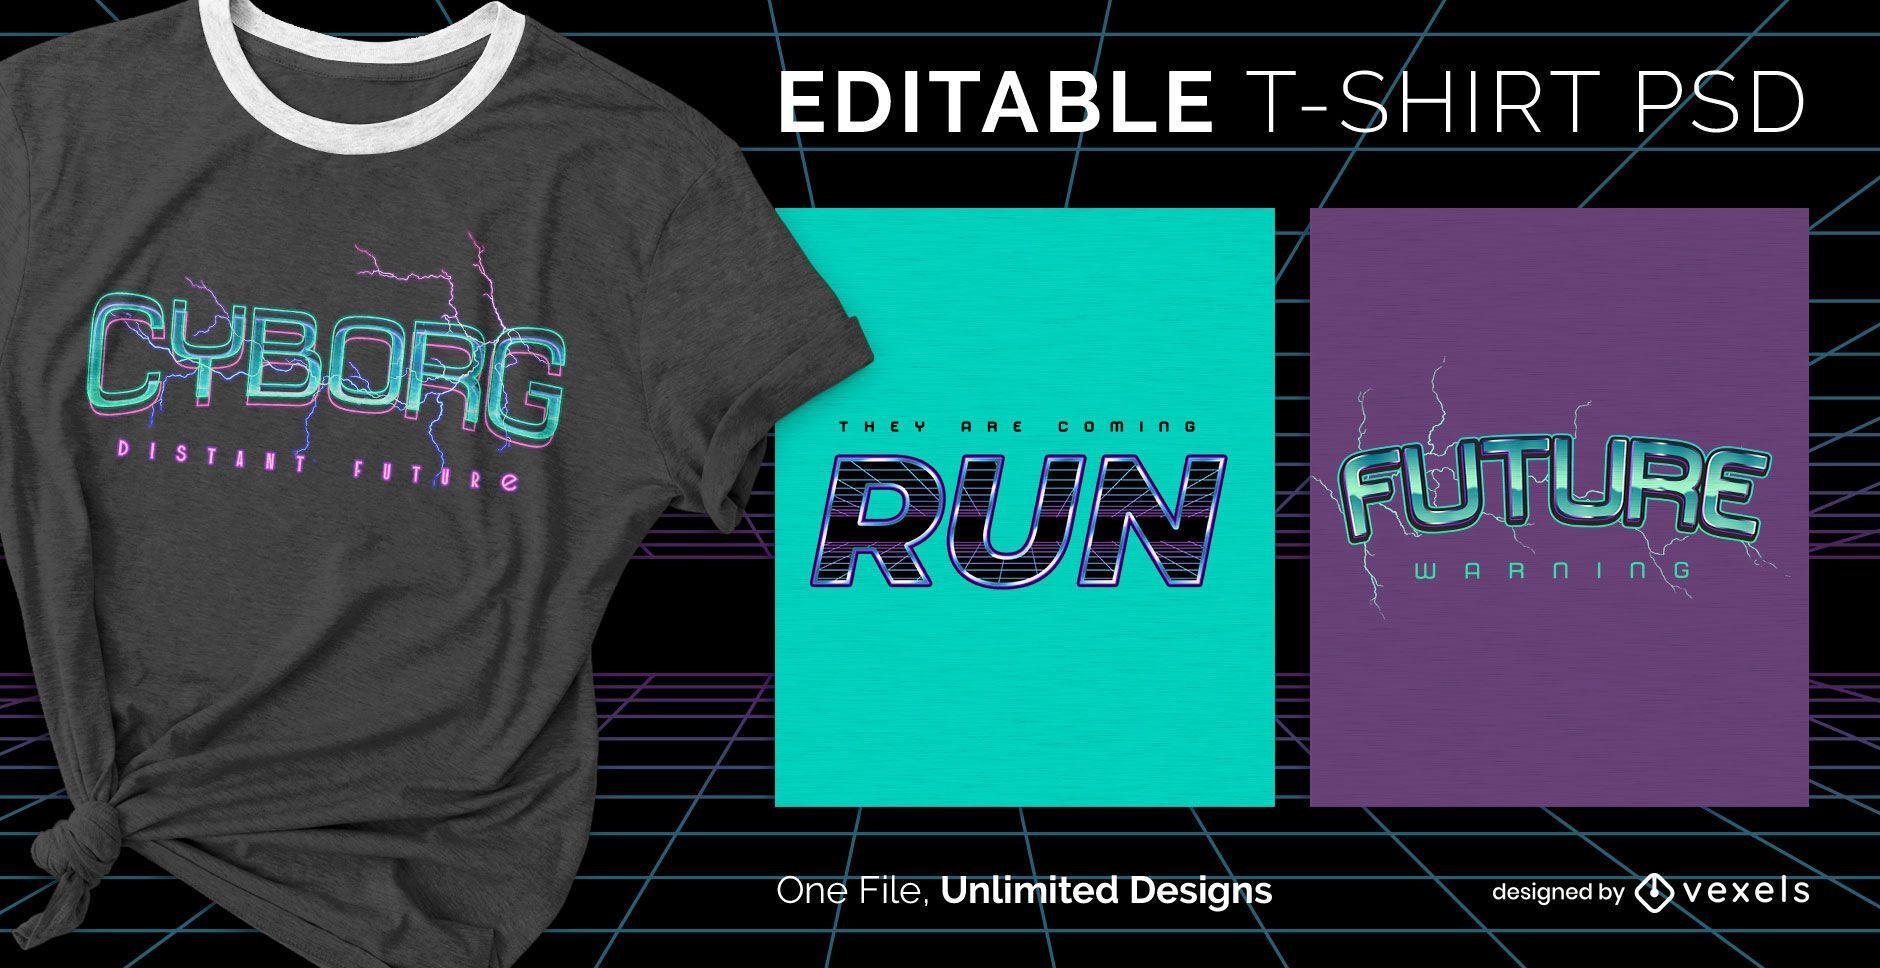 Futuristic text scalable t-shirt psd